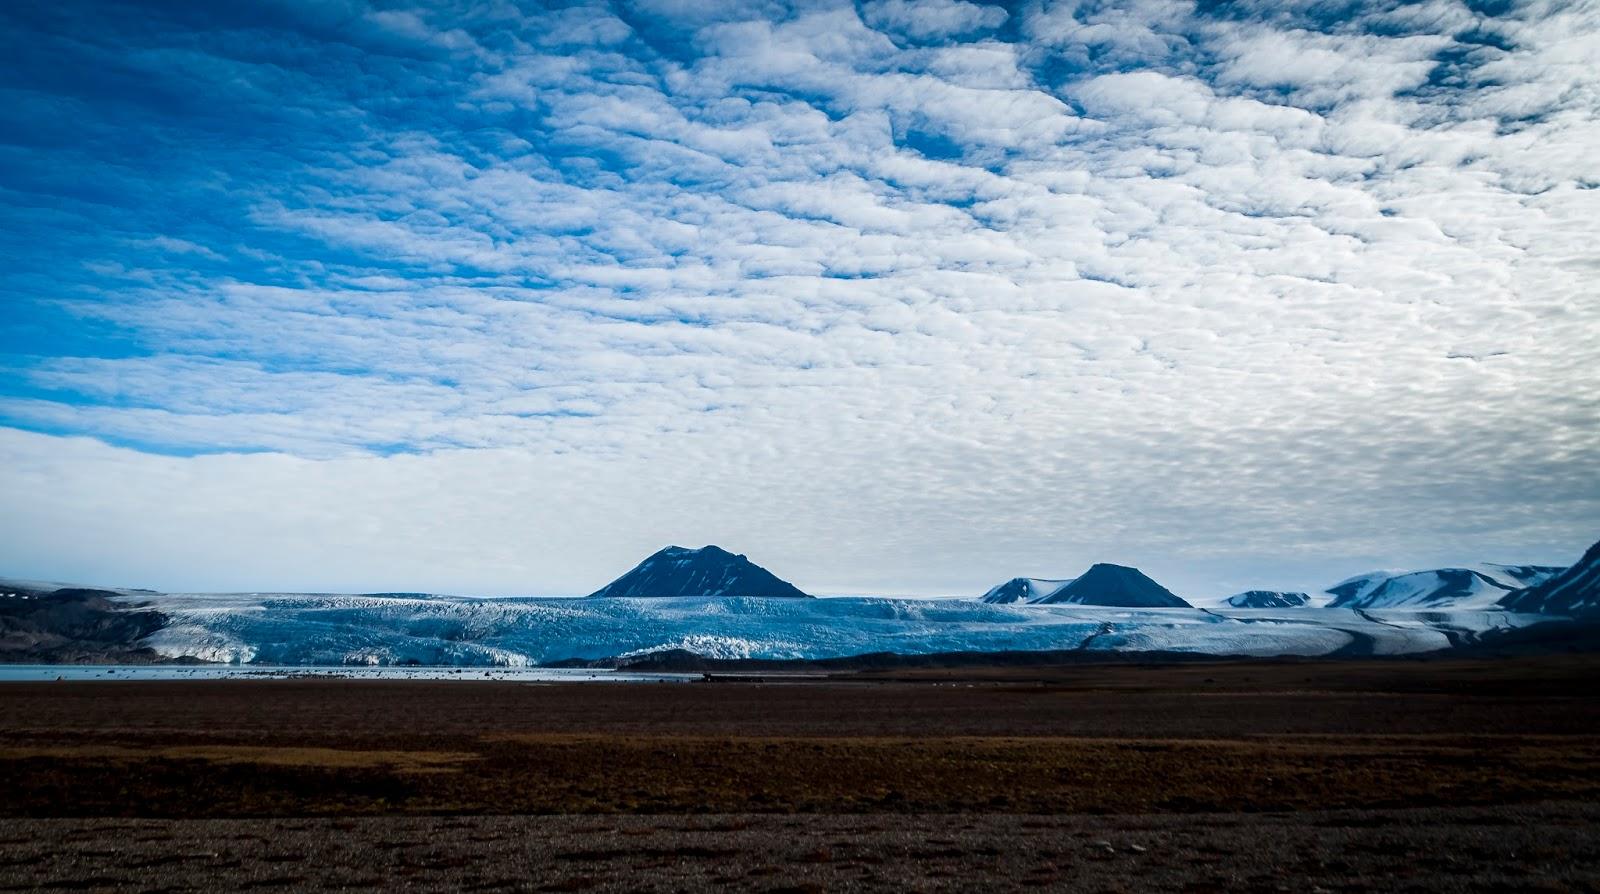 svalbard kayak glacier spitzberg